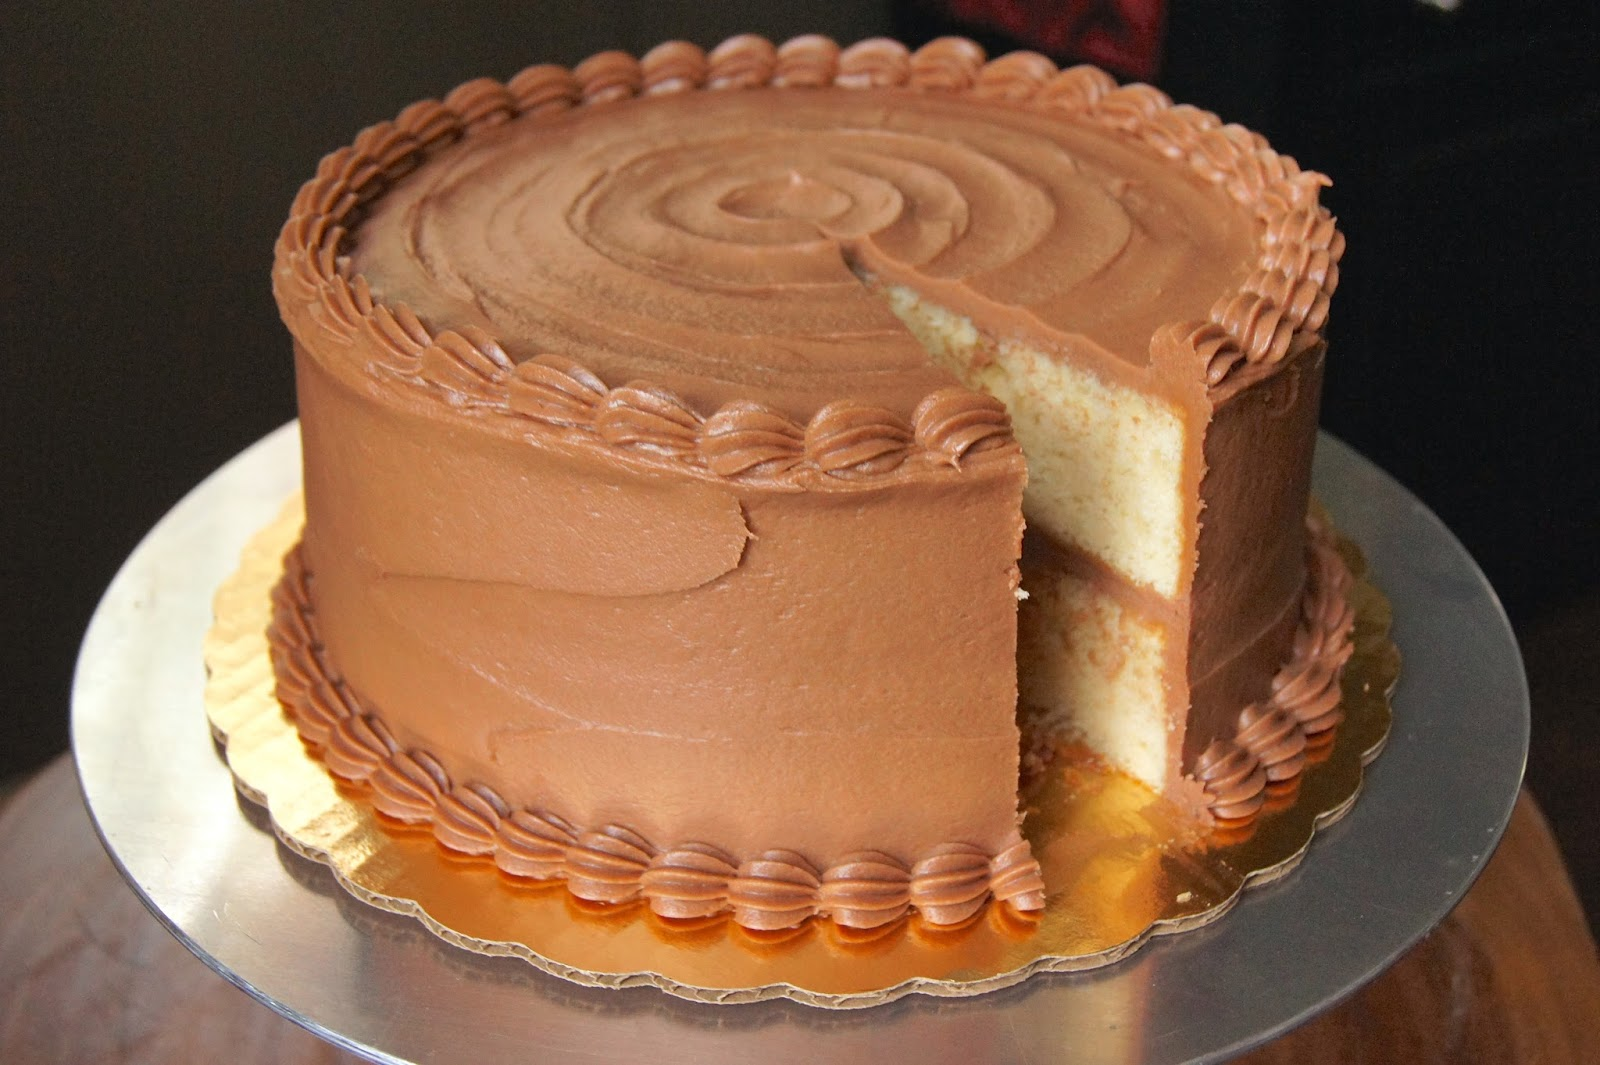 Baked Sunday Mornings Everyones Favorite Birthday Cake Ipso Fatto - Favorite birthday cake